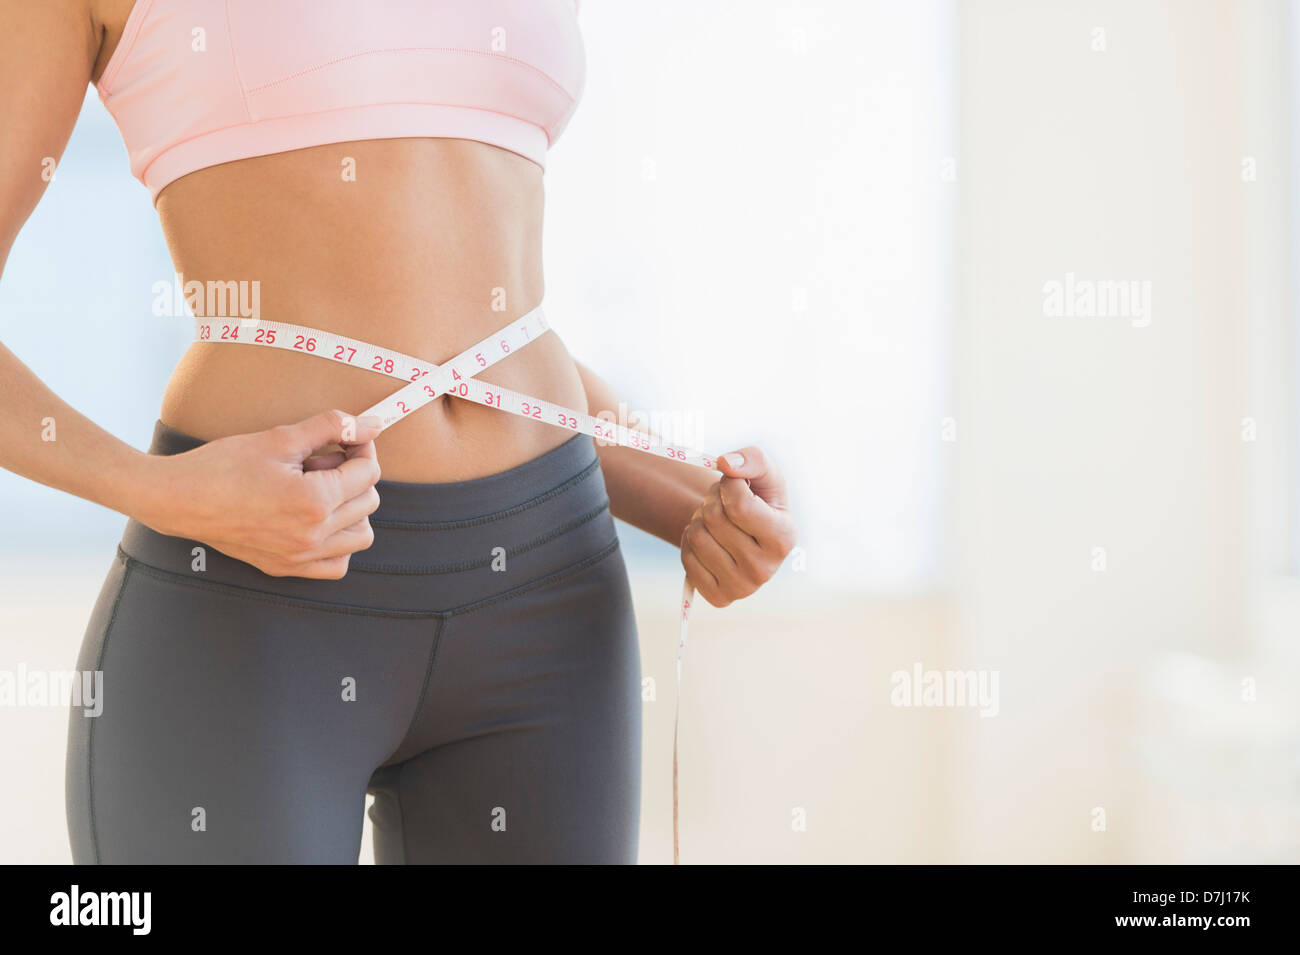 Woman measuring waist - Stock Image